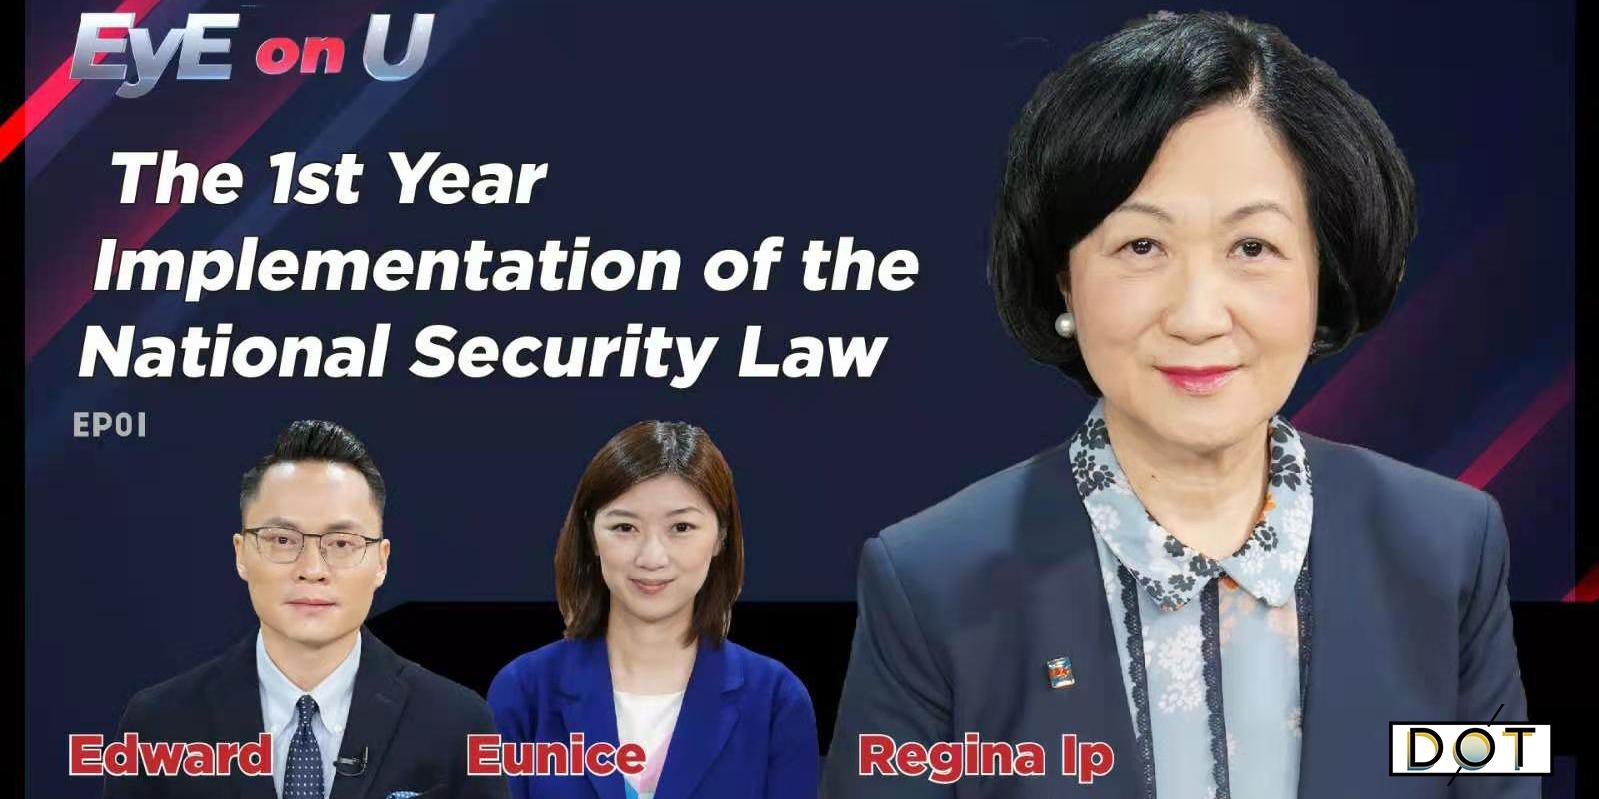 EyE on U | Regina Ip: National security law brings 'dramatic turnaround' to situation in HK